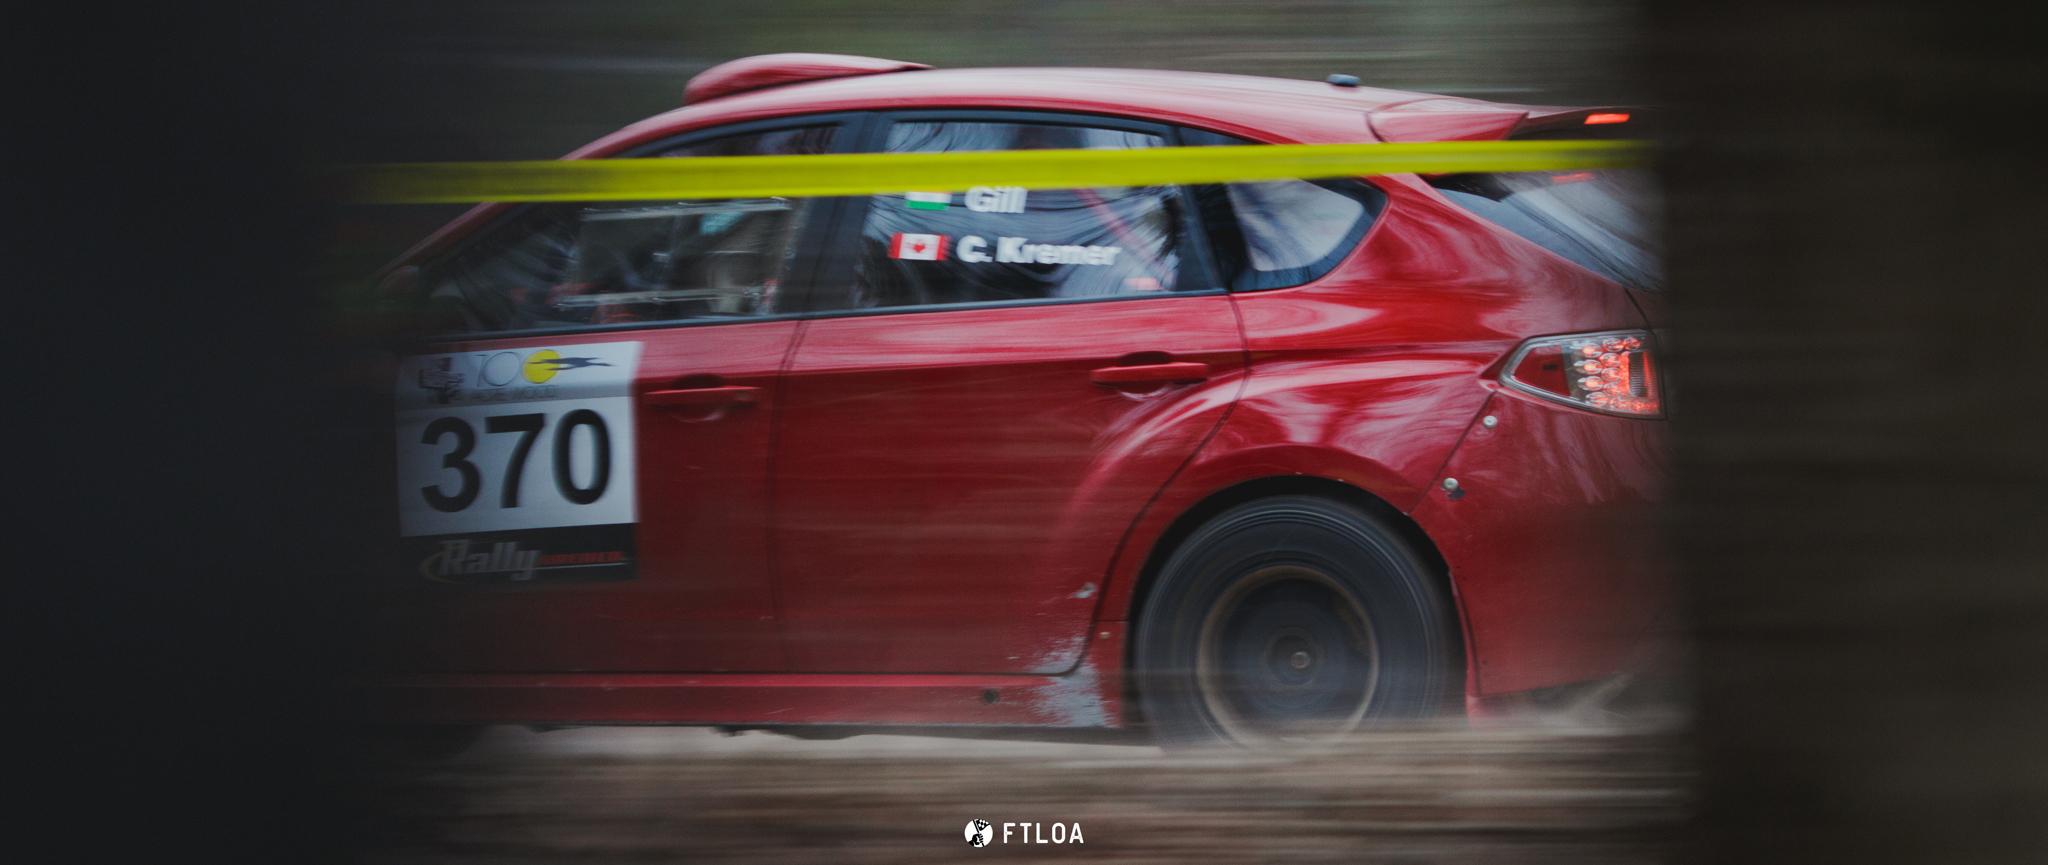 rallyinthe100acrewood-99.jpg